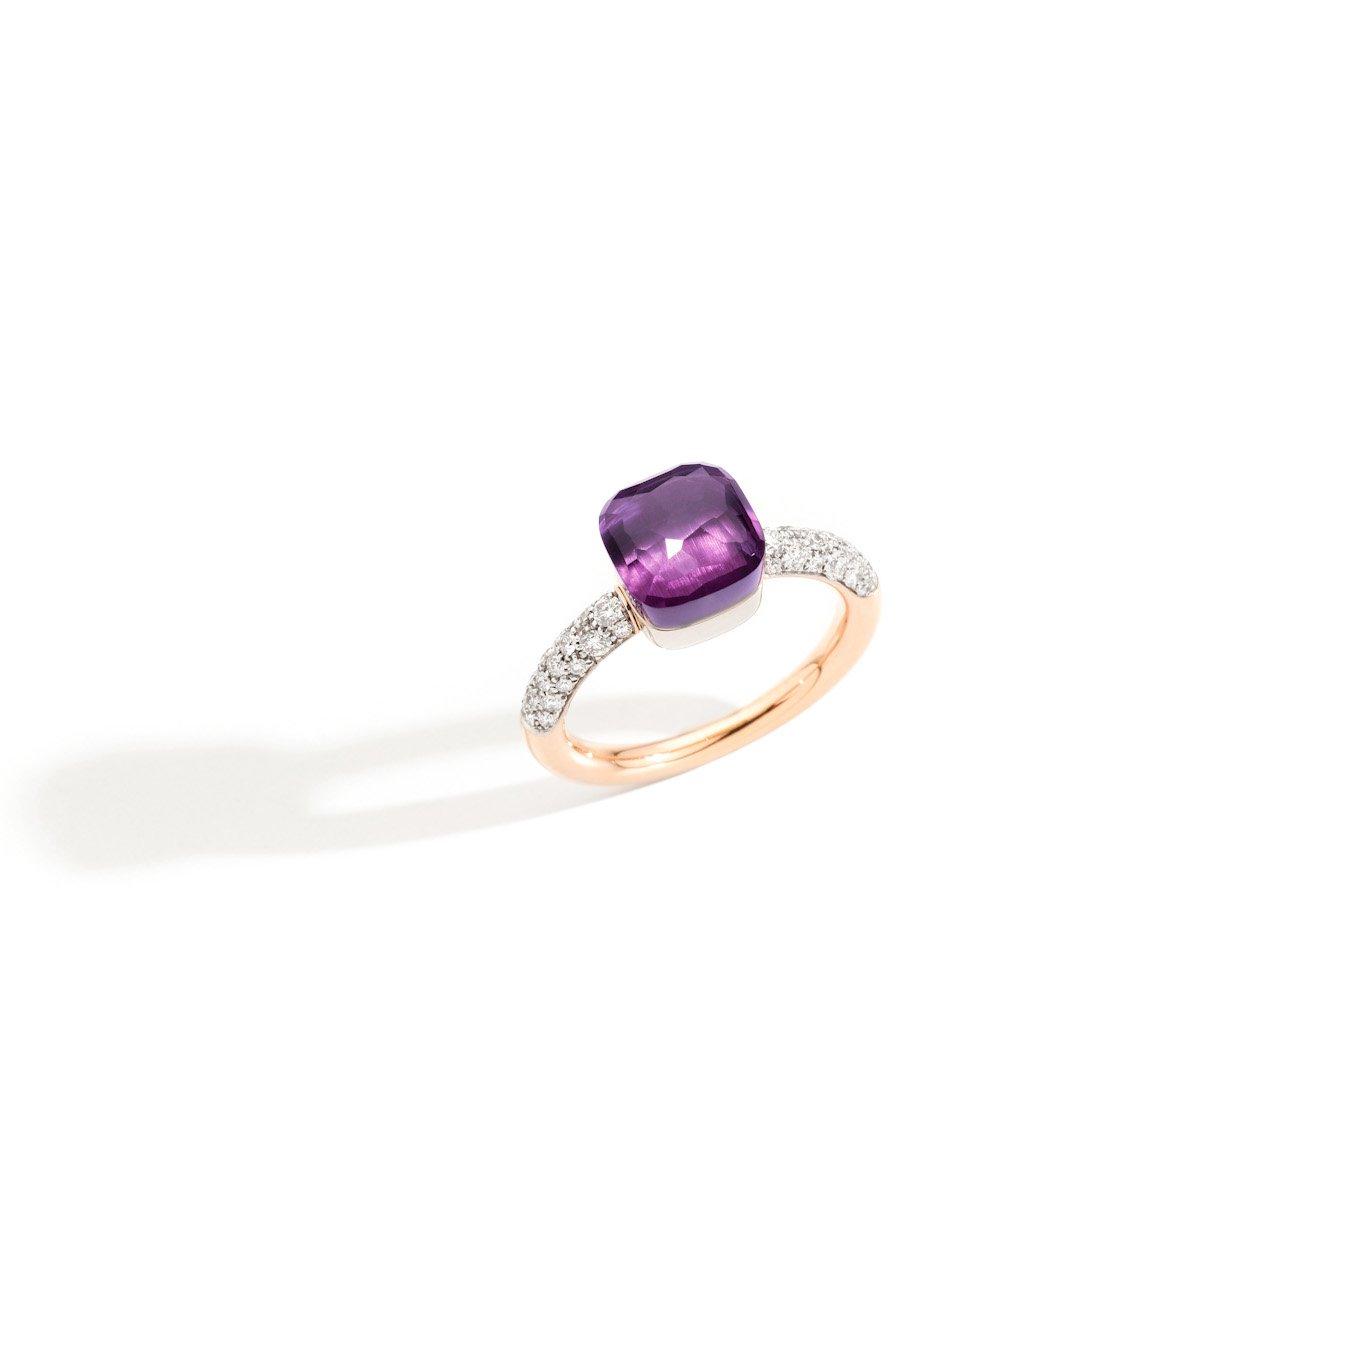 Ring nudo paarse steen en diamant